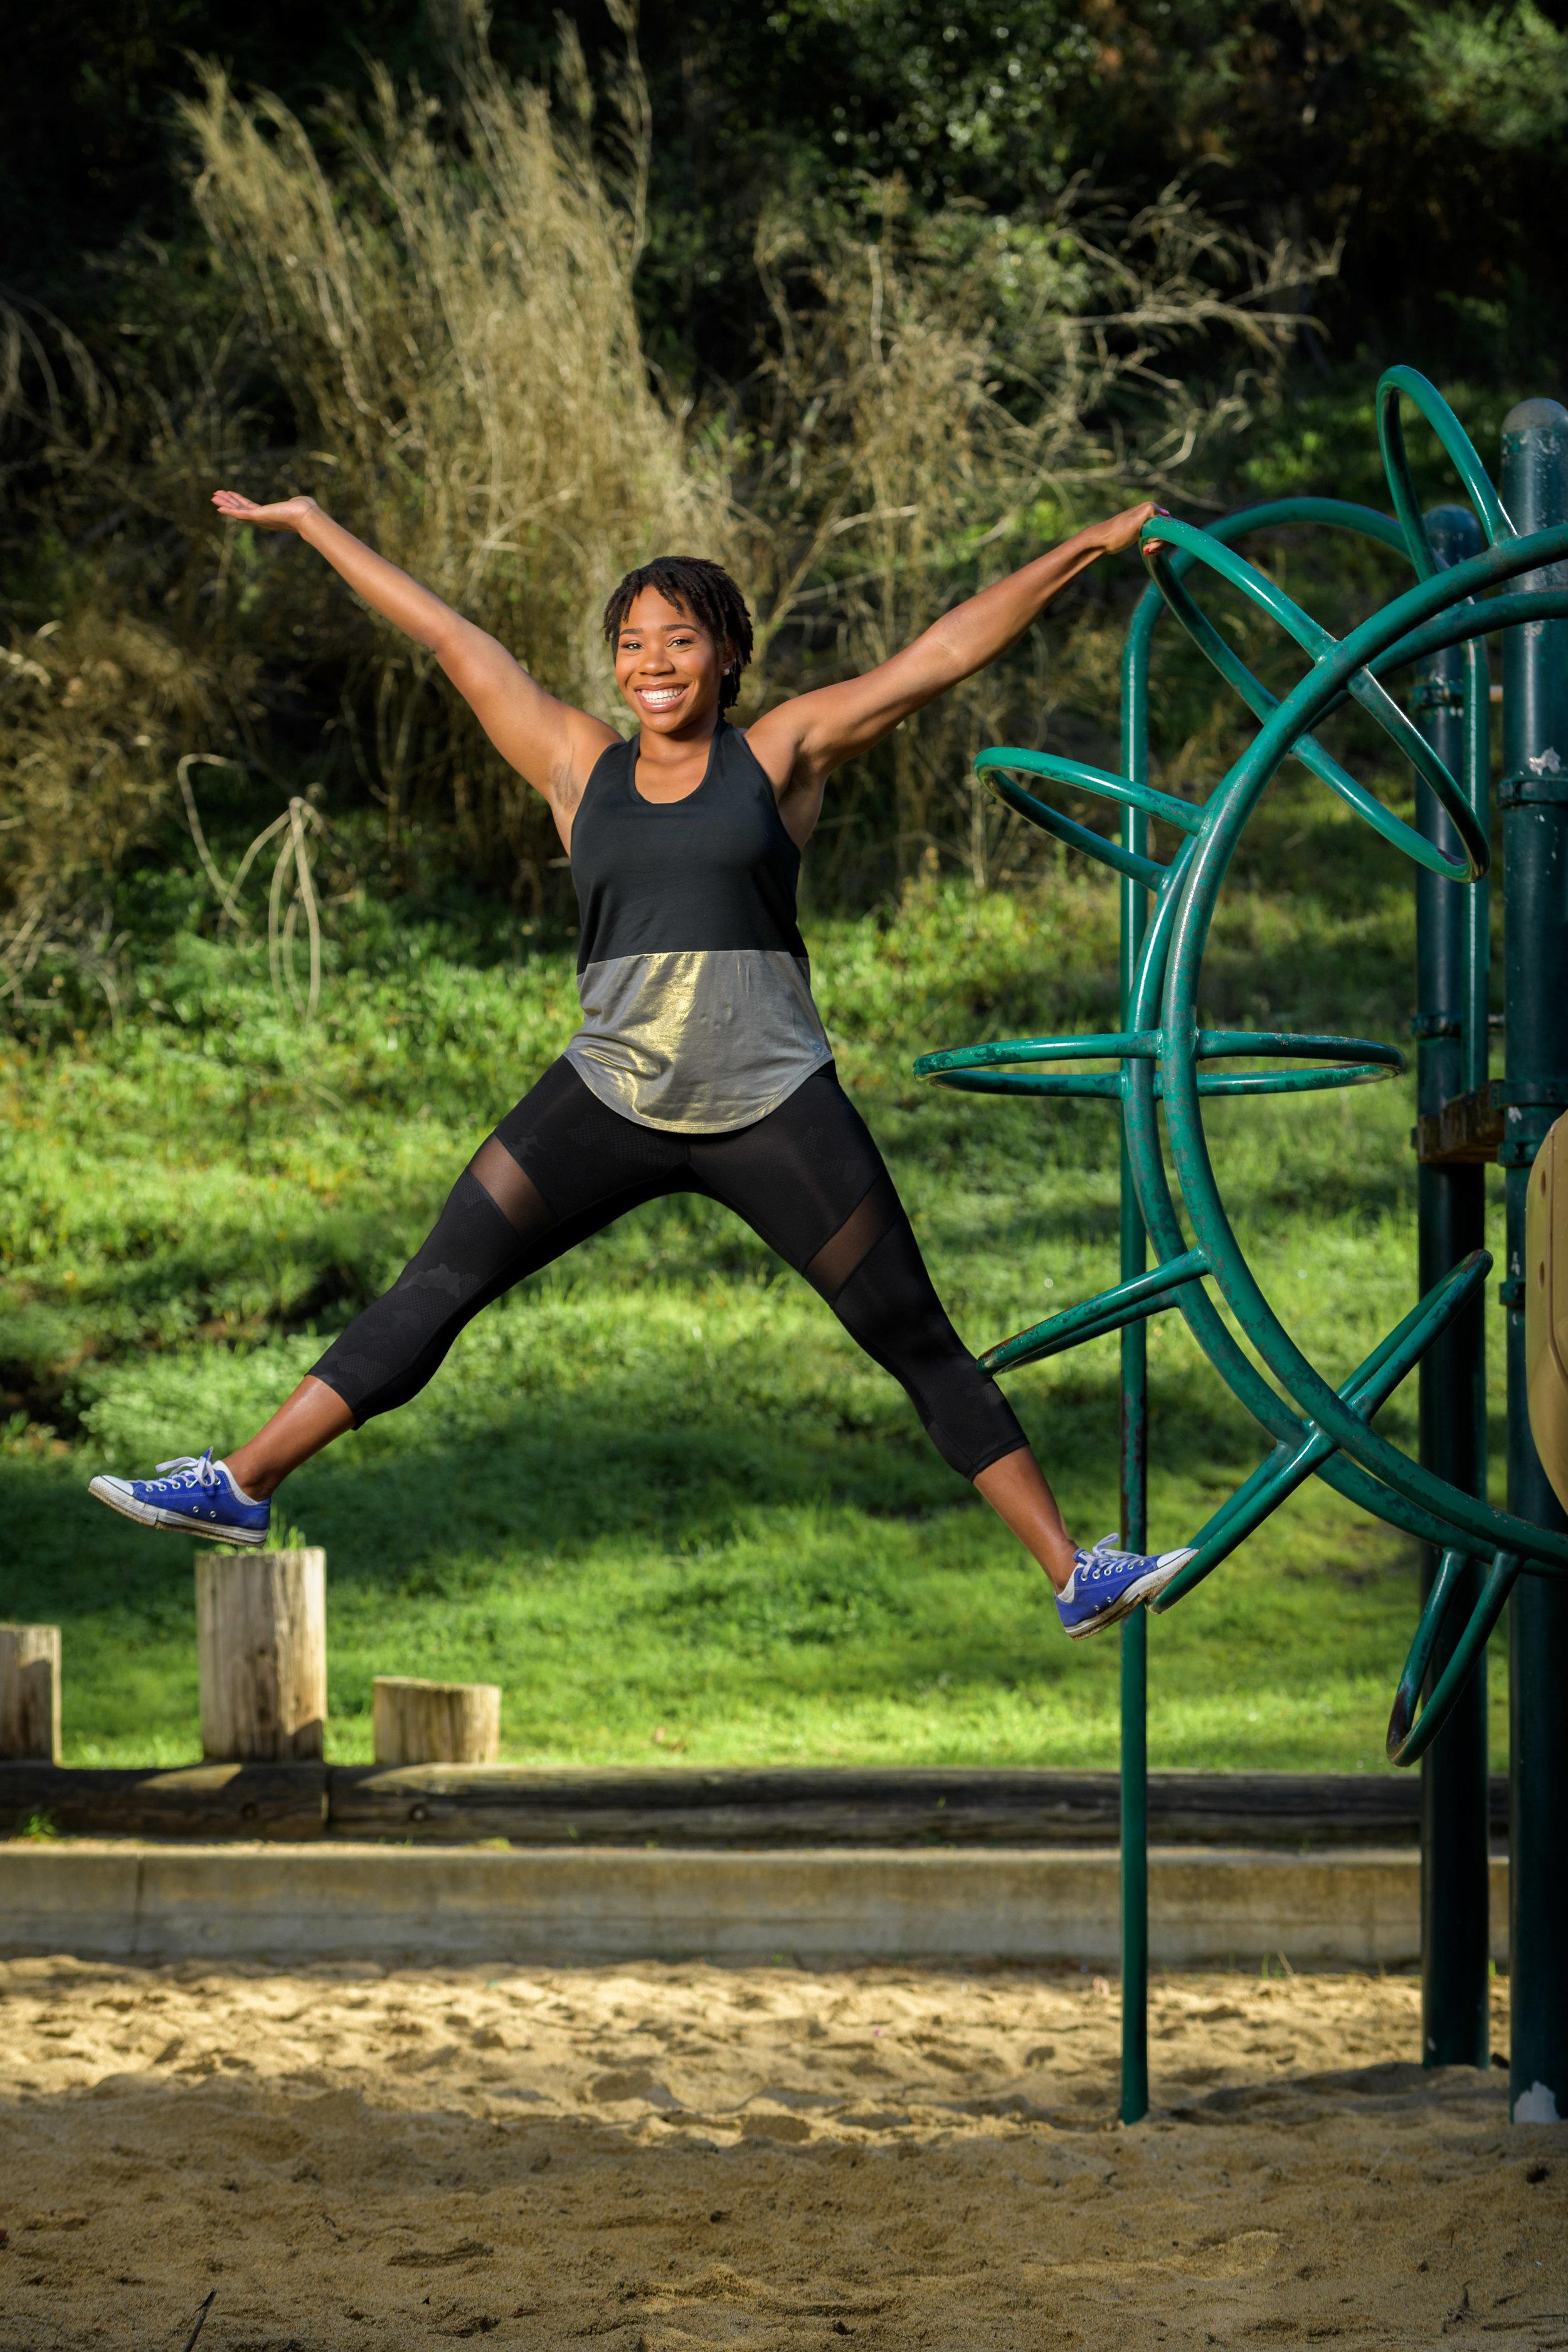 7088_Grace_S_Aptos_Playground_Fitness_Photography.jpg